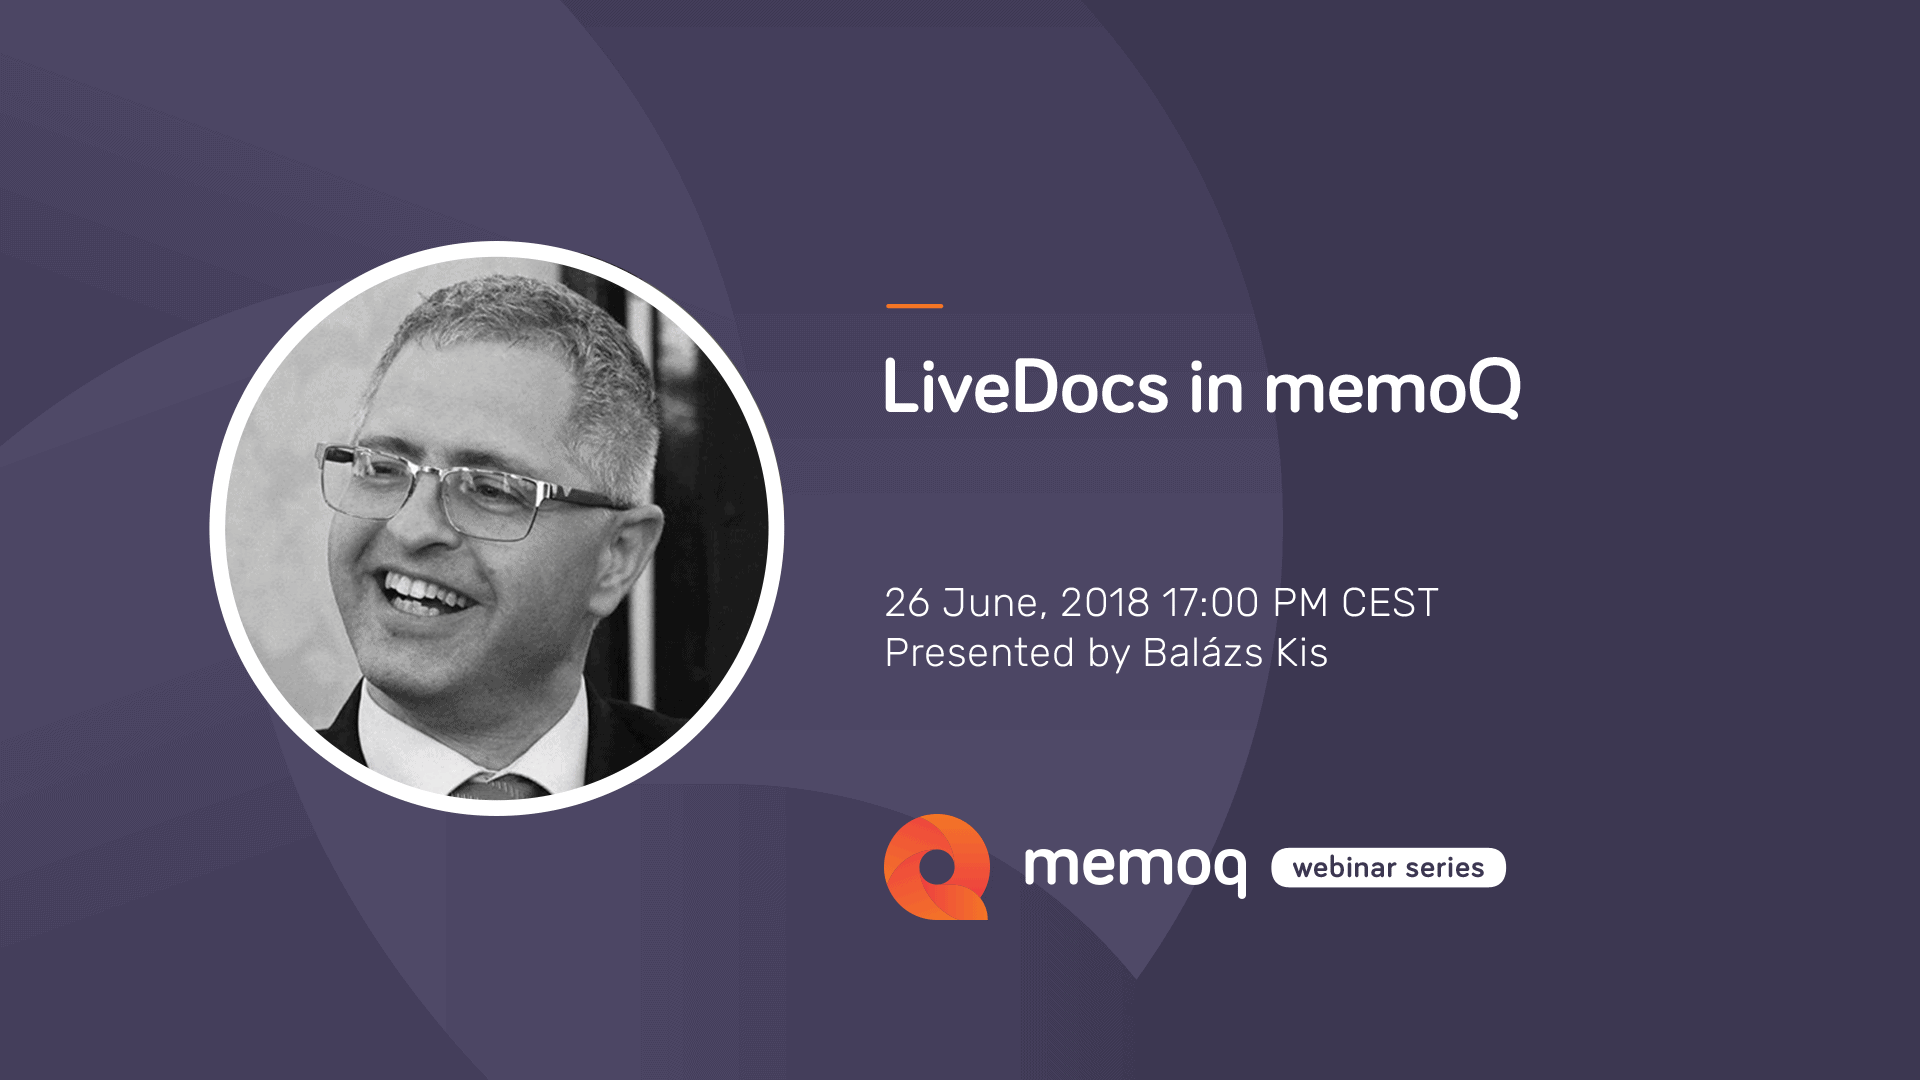 LiveDocs webinar - memoQ